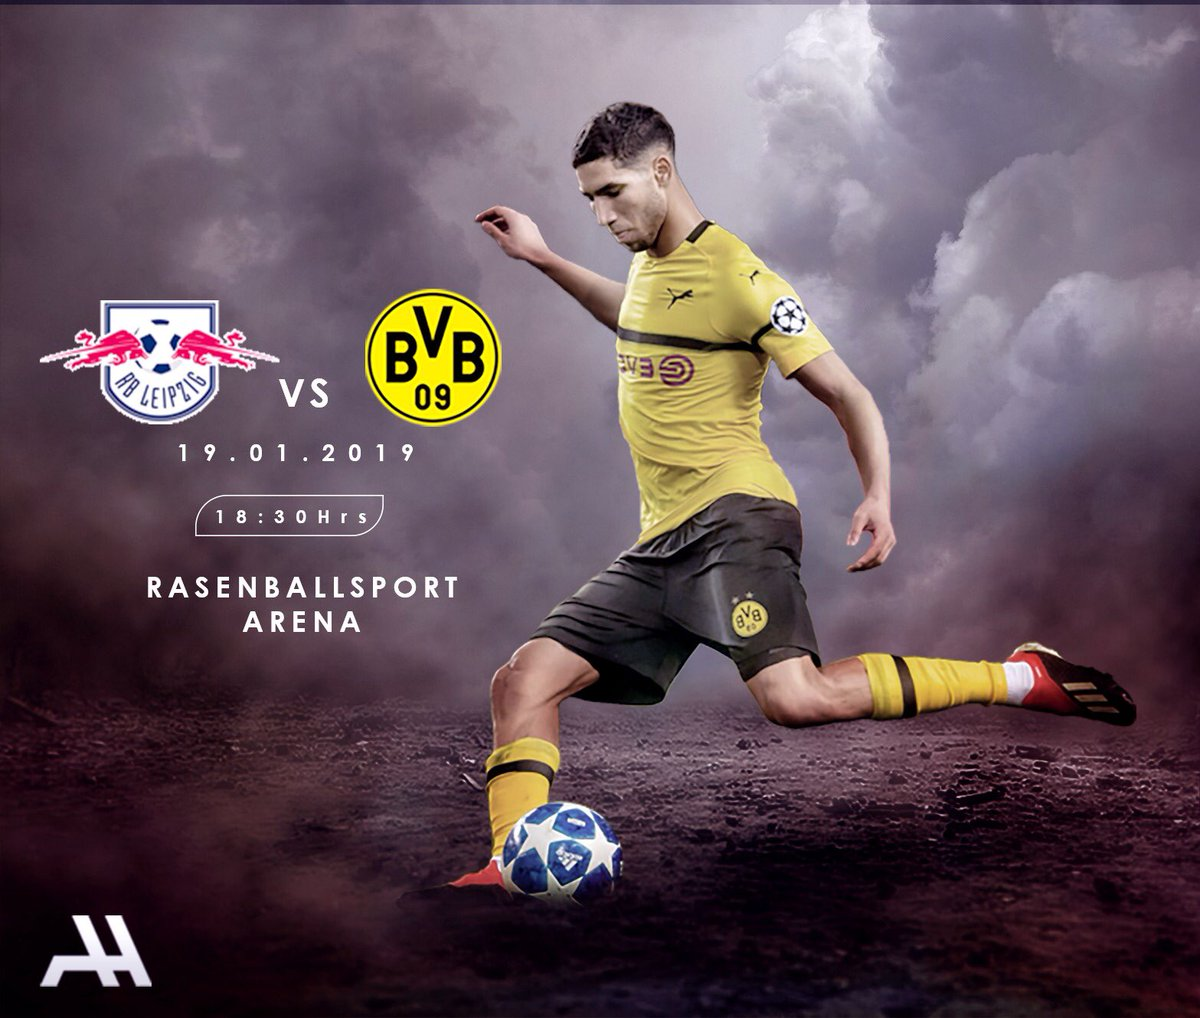 🏆 Bundesliga  🆚 RasenballSport 🏟 RasenballSport Arena 🗓️ Saturday, January 19th ⏰ 18:30 ⚽️🐝 #RBLBVB